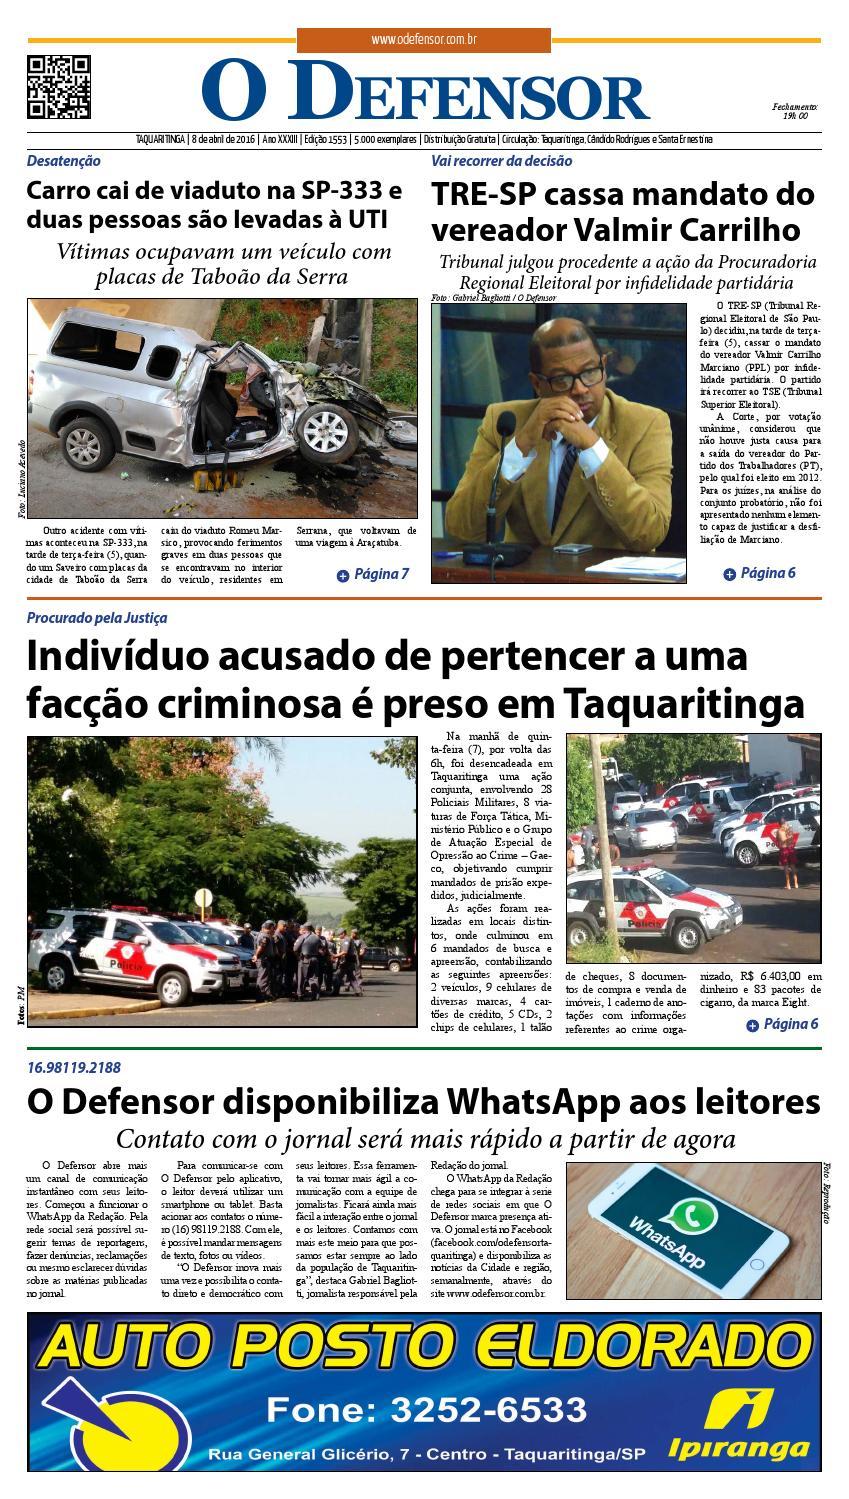 Jornal O Defensor 8 de abril de 2016 by gabriel baglioti - issuu 30d0ef7607df1